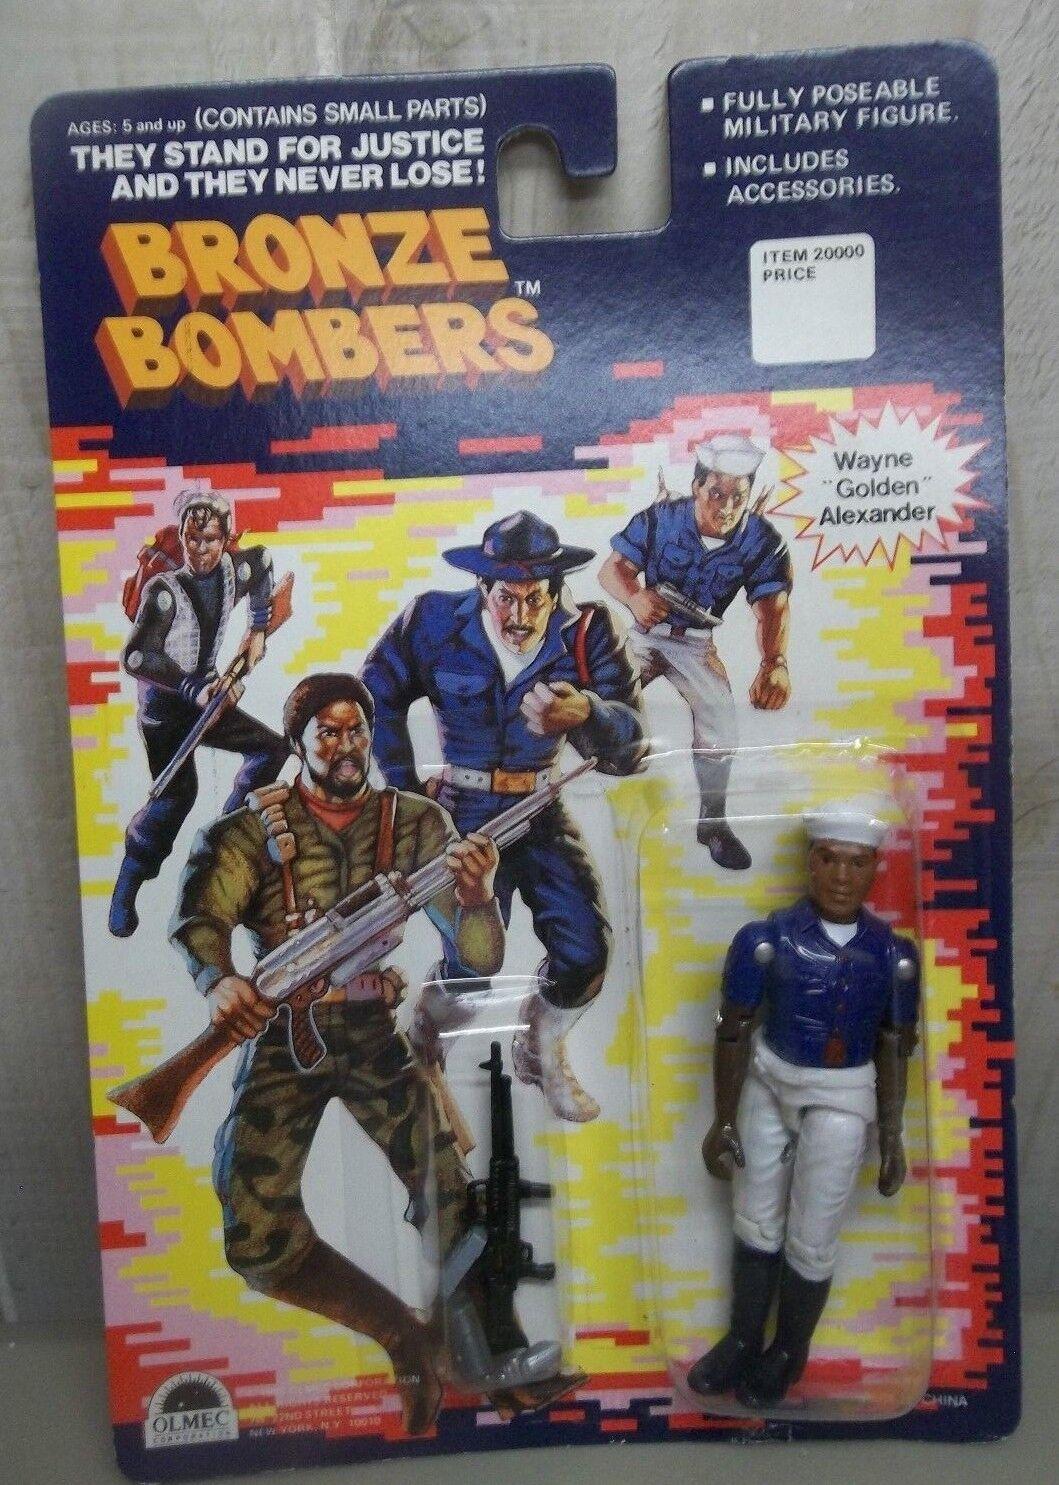 Bronze bomber wayne Goldene alexander olmeken 1988 afro - amerikaner - auf der karte)